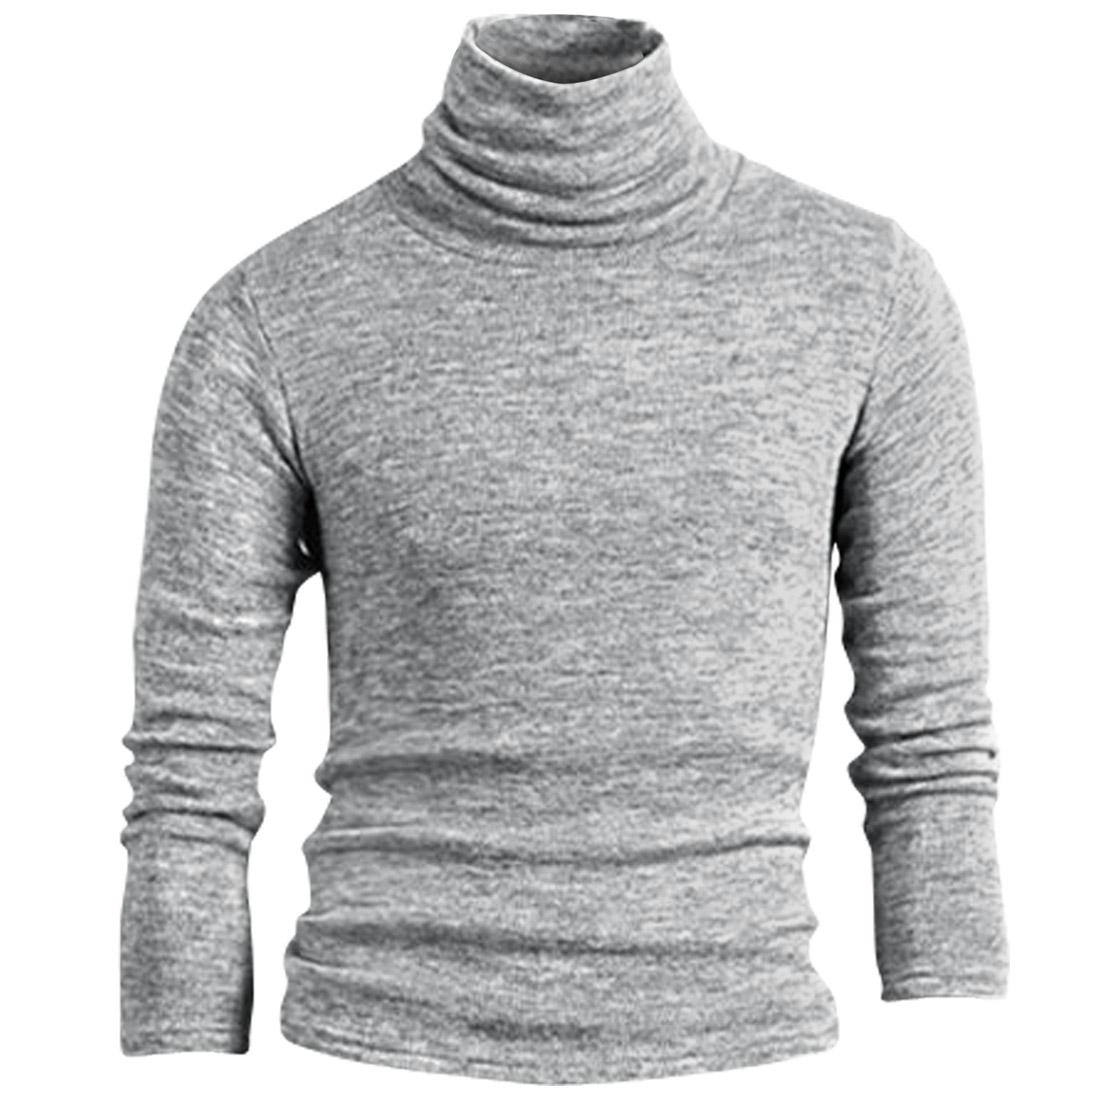 Men Pullover Turtle Neck Slim Knit Light Gray Shirt S